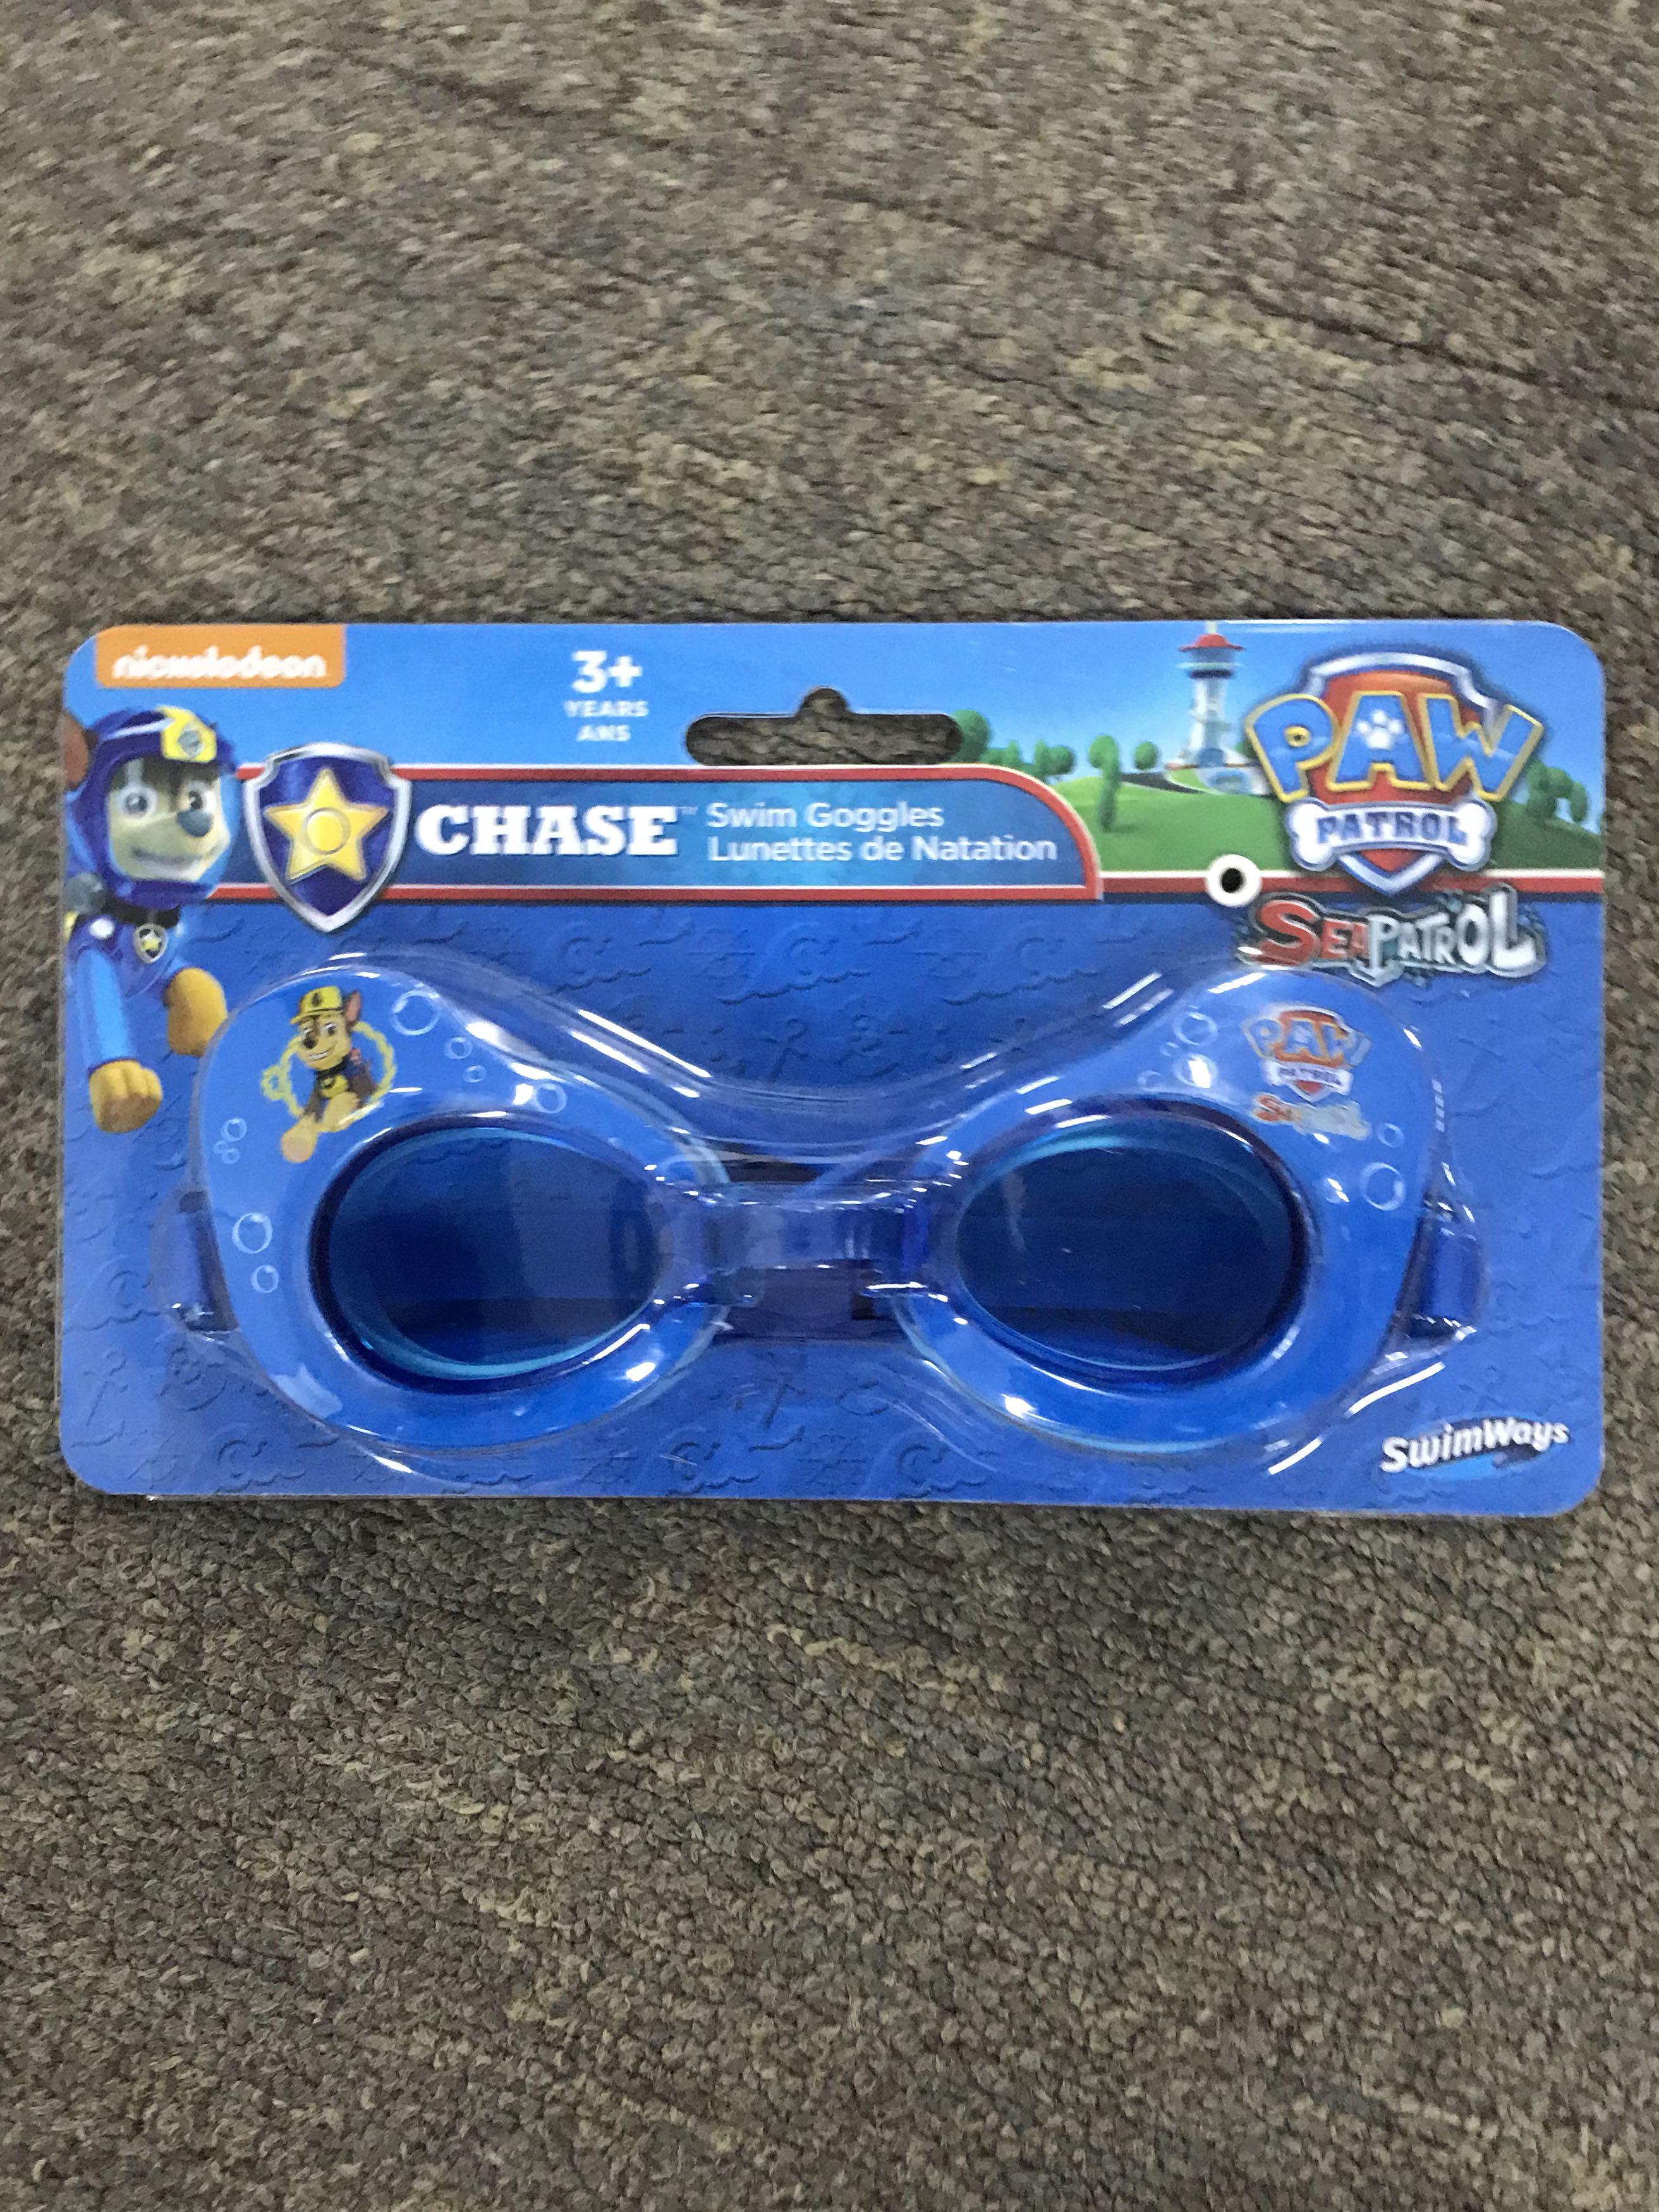 441b7ac49b Bn swimways swim goggles paw patrol chase sports games swimming goggles paw  patrol snarkle jpg 2625x3499